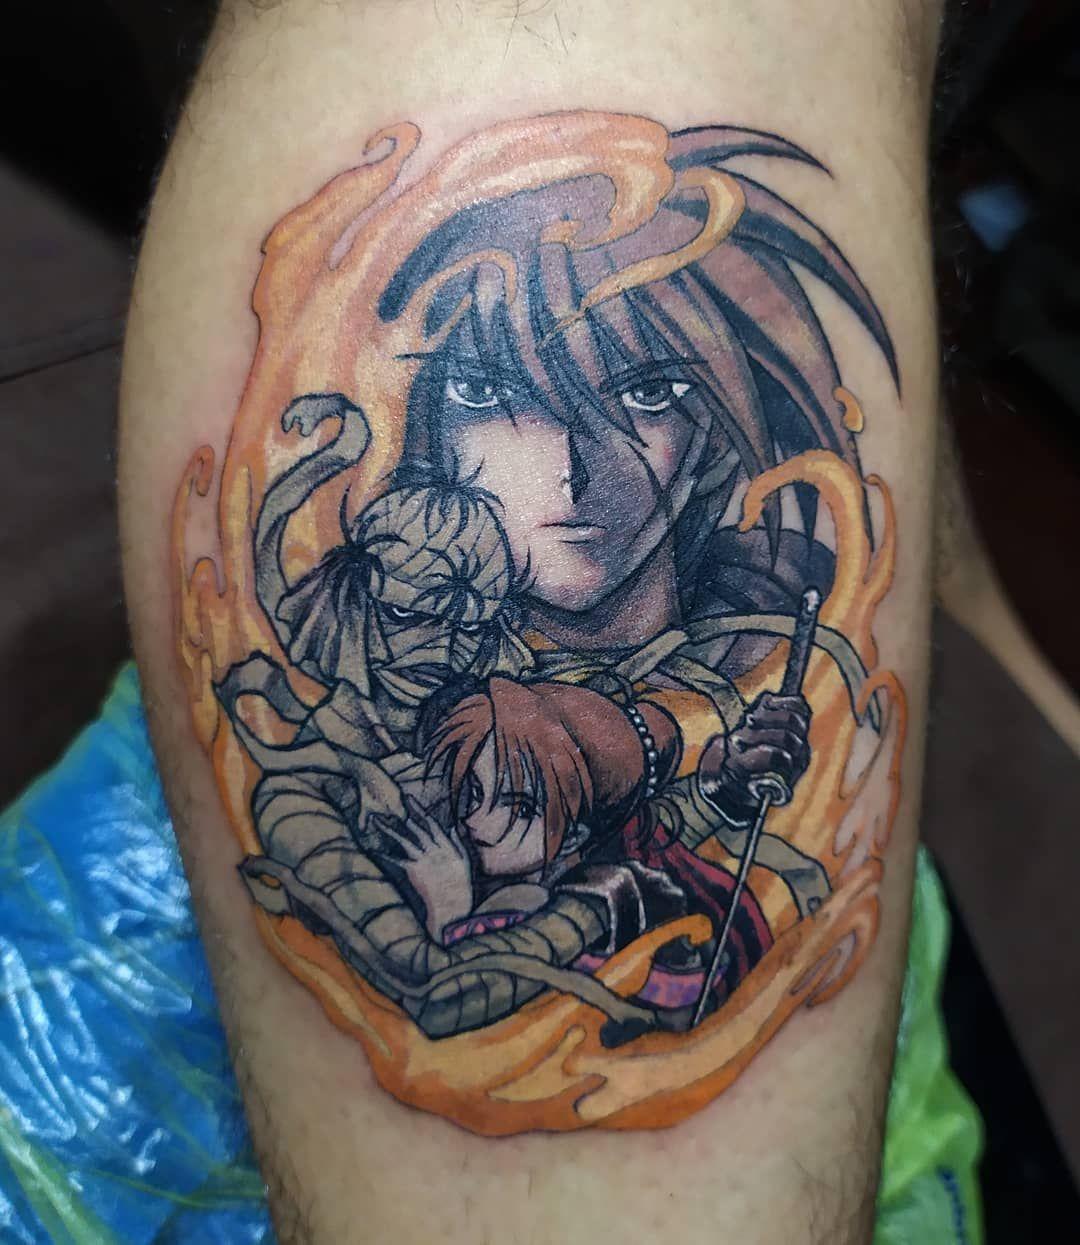 Samurai X Tattoo De Esta Noche Para Mi Bro Claudio Buen Aguante Y Gracias Por L Samurai tattoo by bhanu pratap at aliens tattoo india. mi bro claudio buen aguante